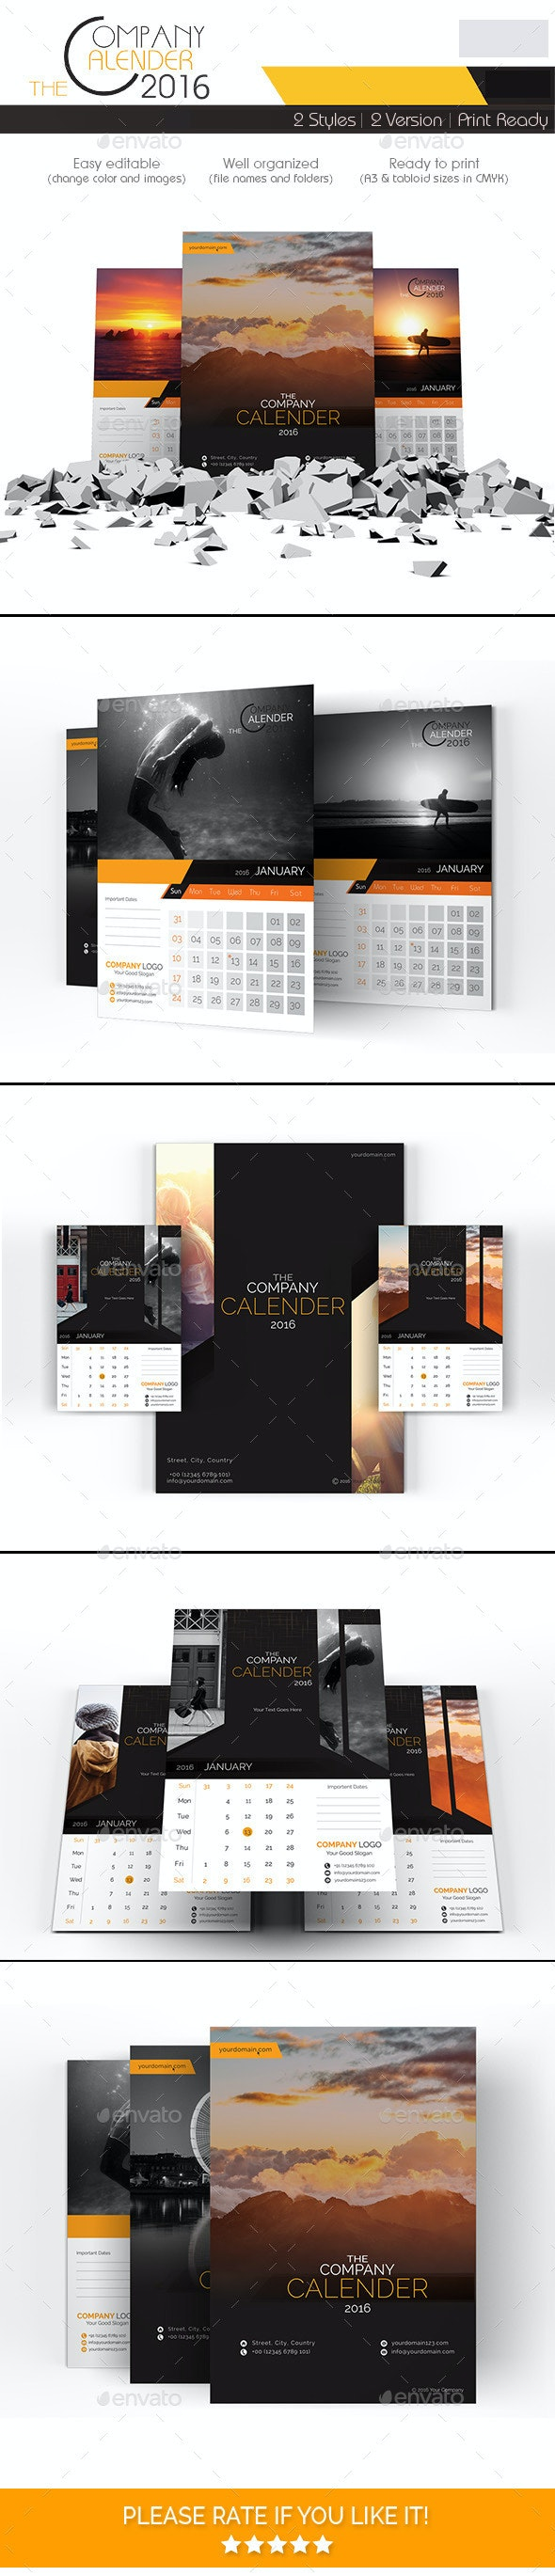 The Company Calendar 2016 - Calendars Stationery